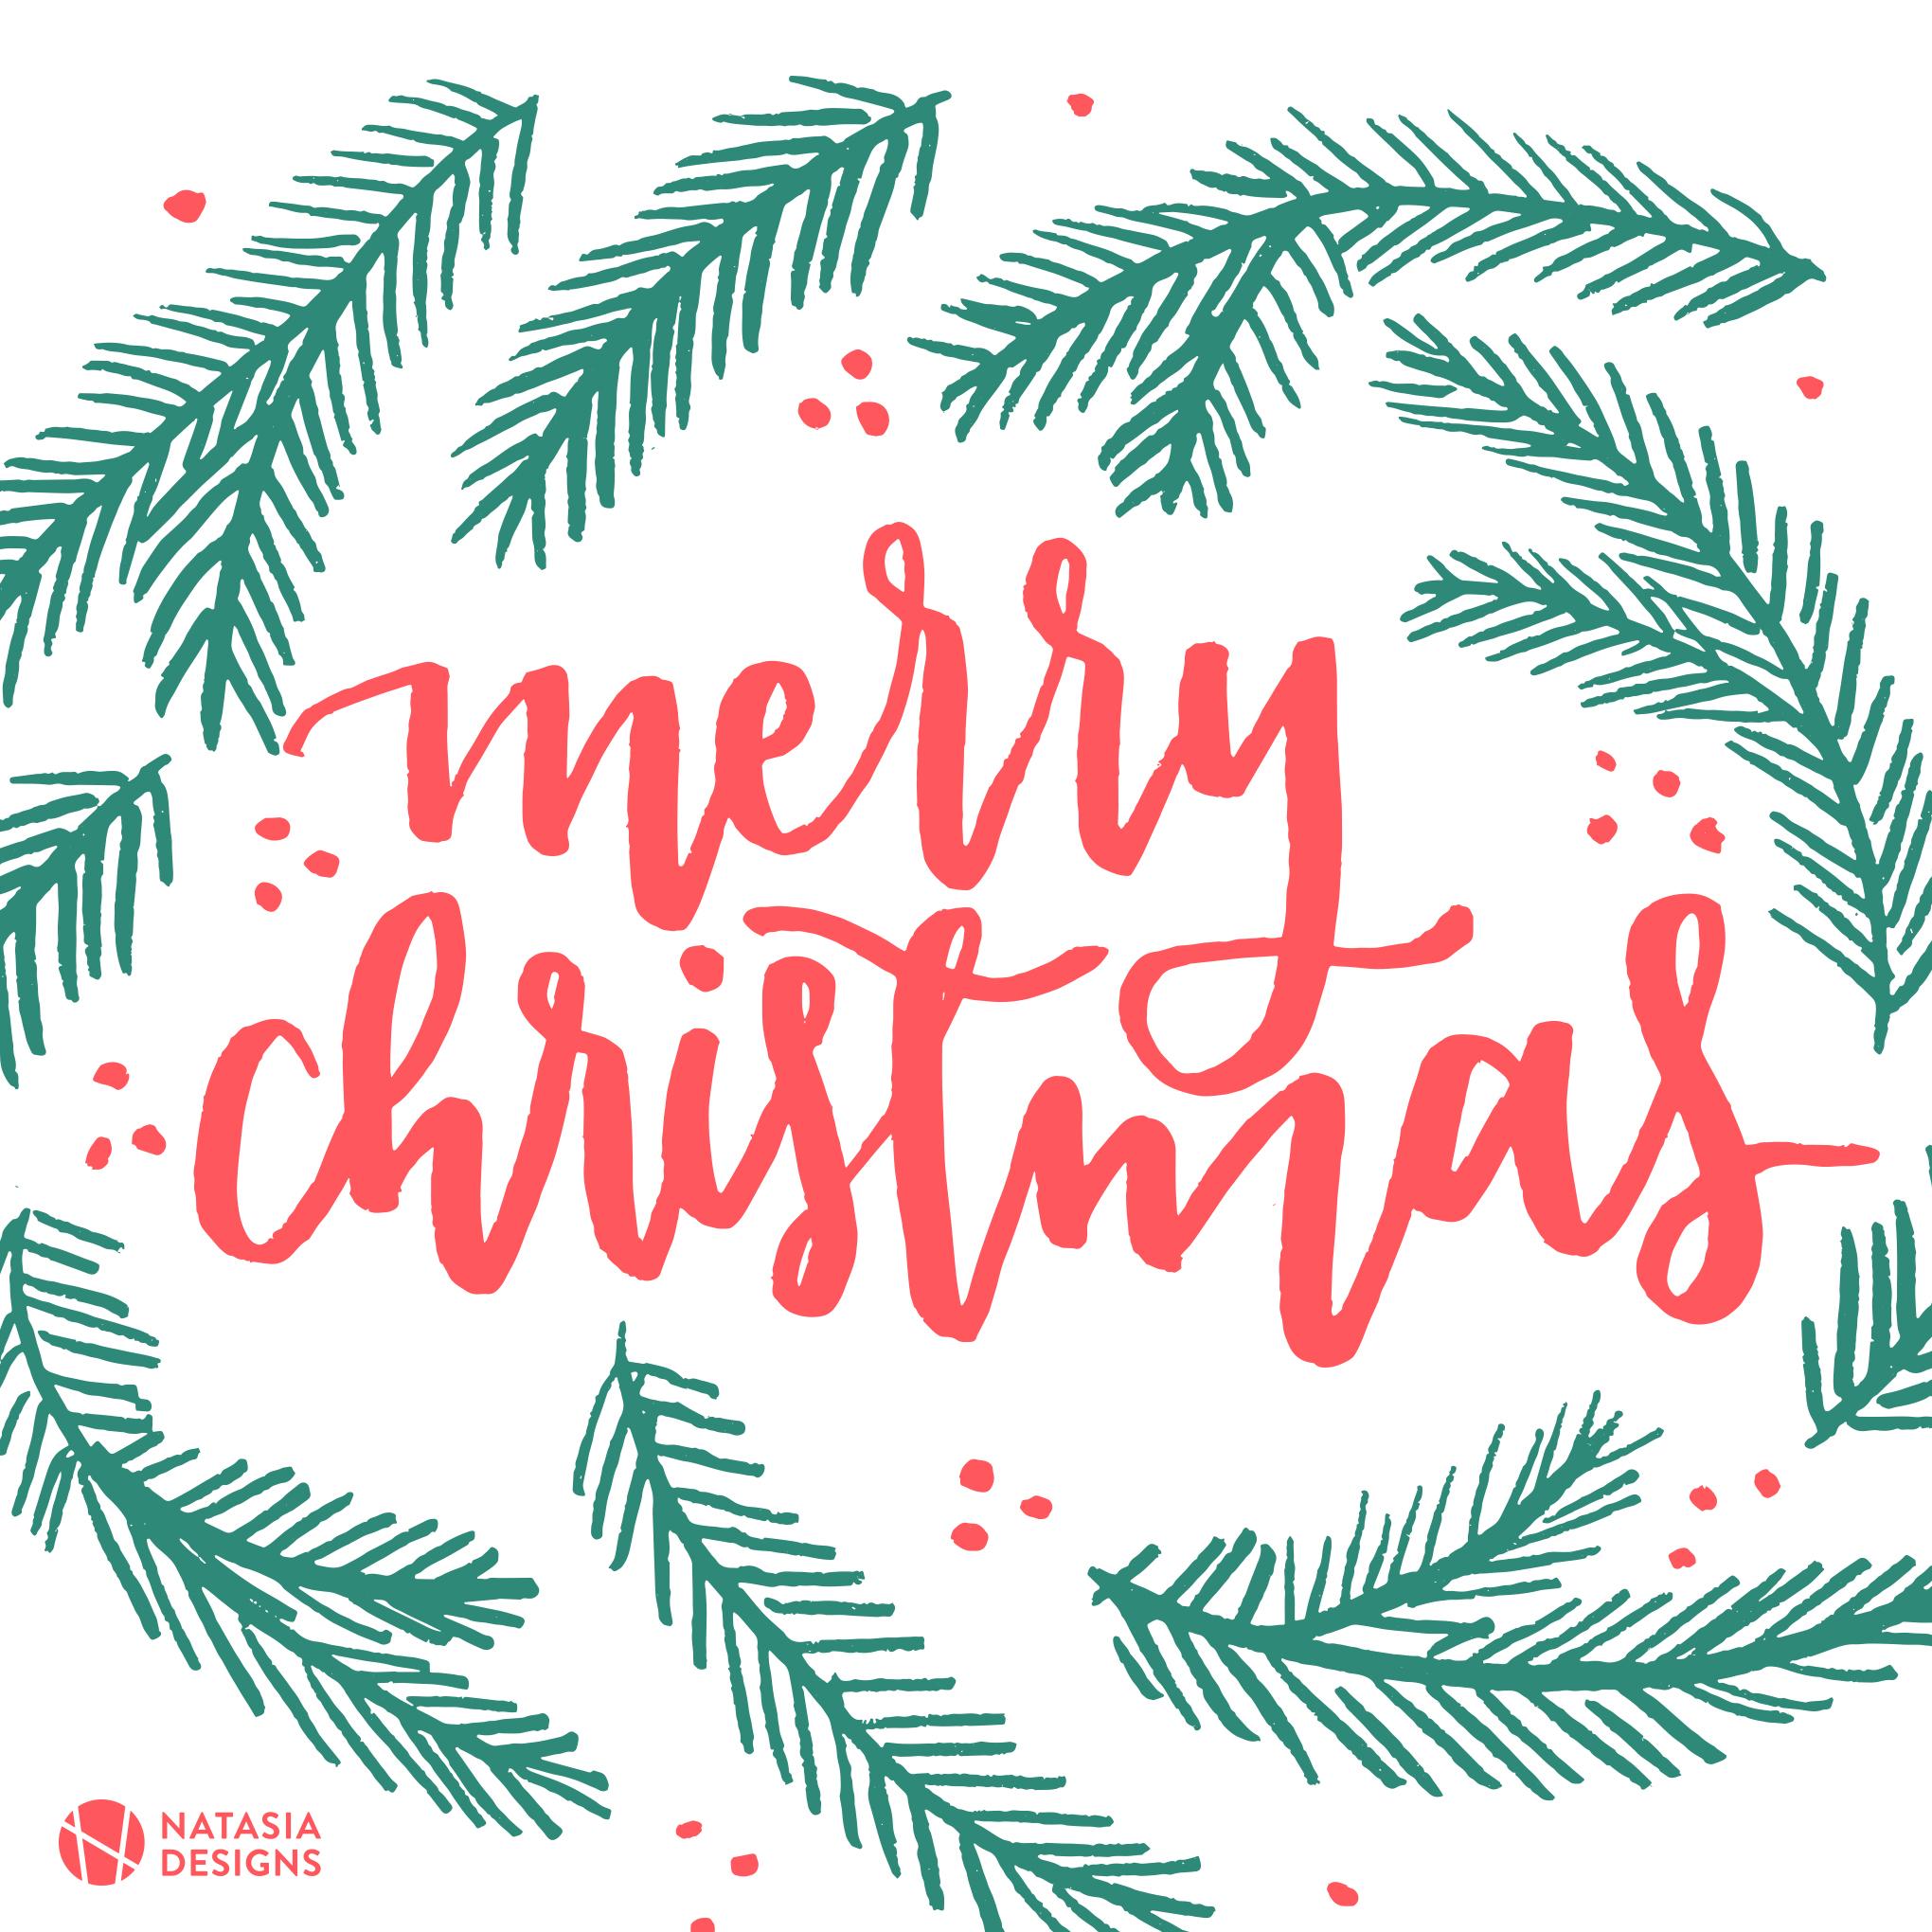 Natasia Designs Christmas Social Media Holiday Post Freebies Free Download